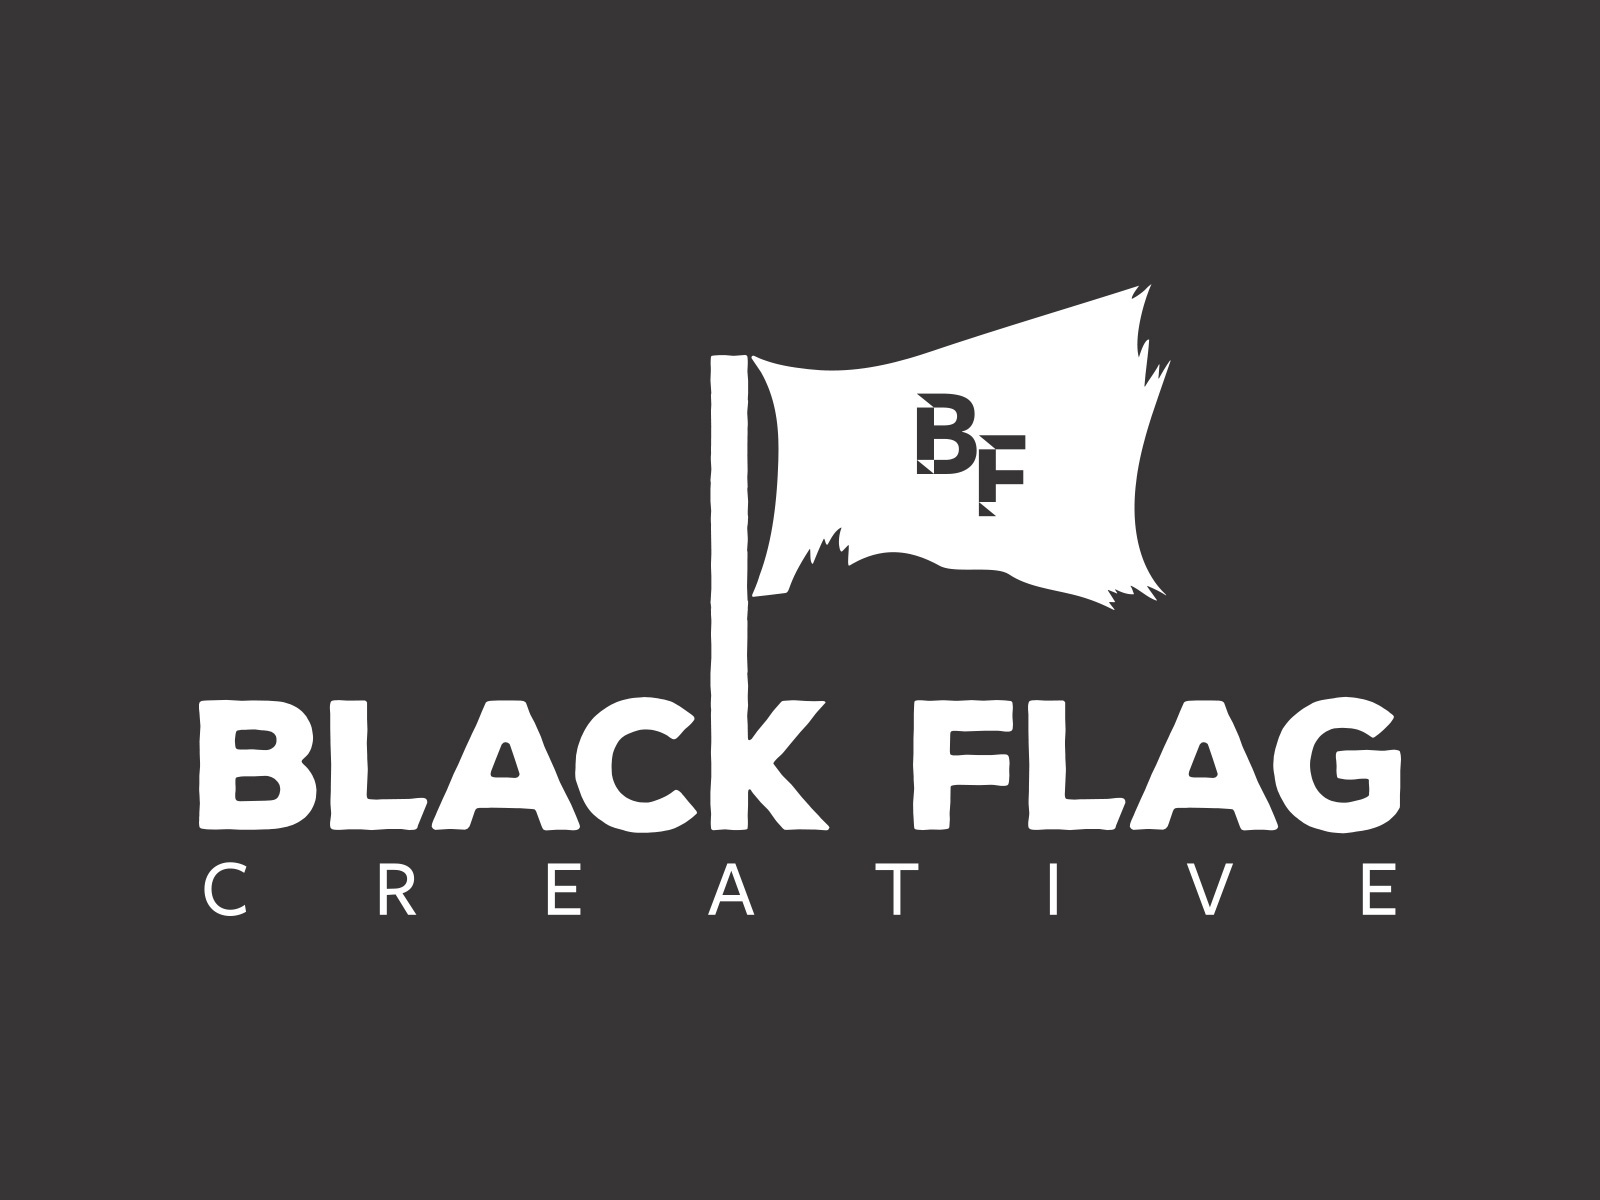 Blackflagcreativelogo large white